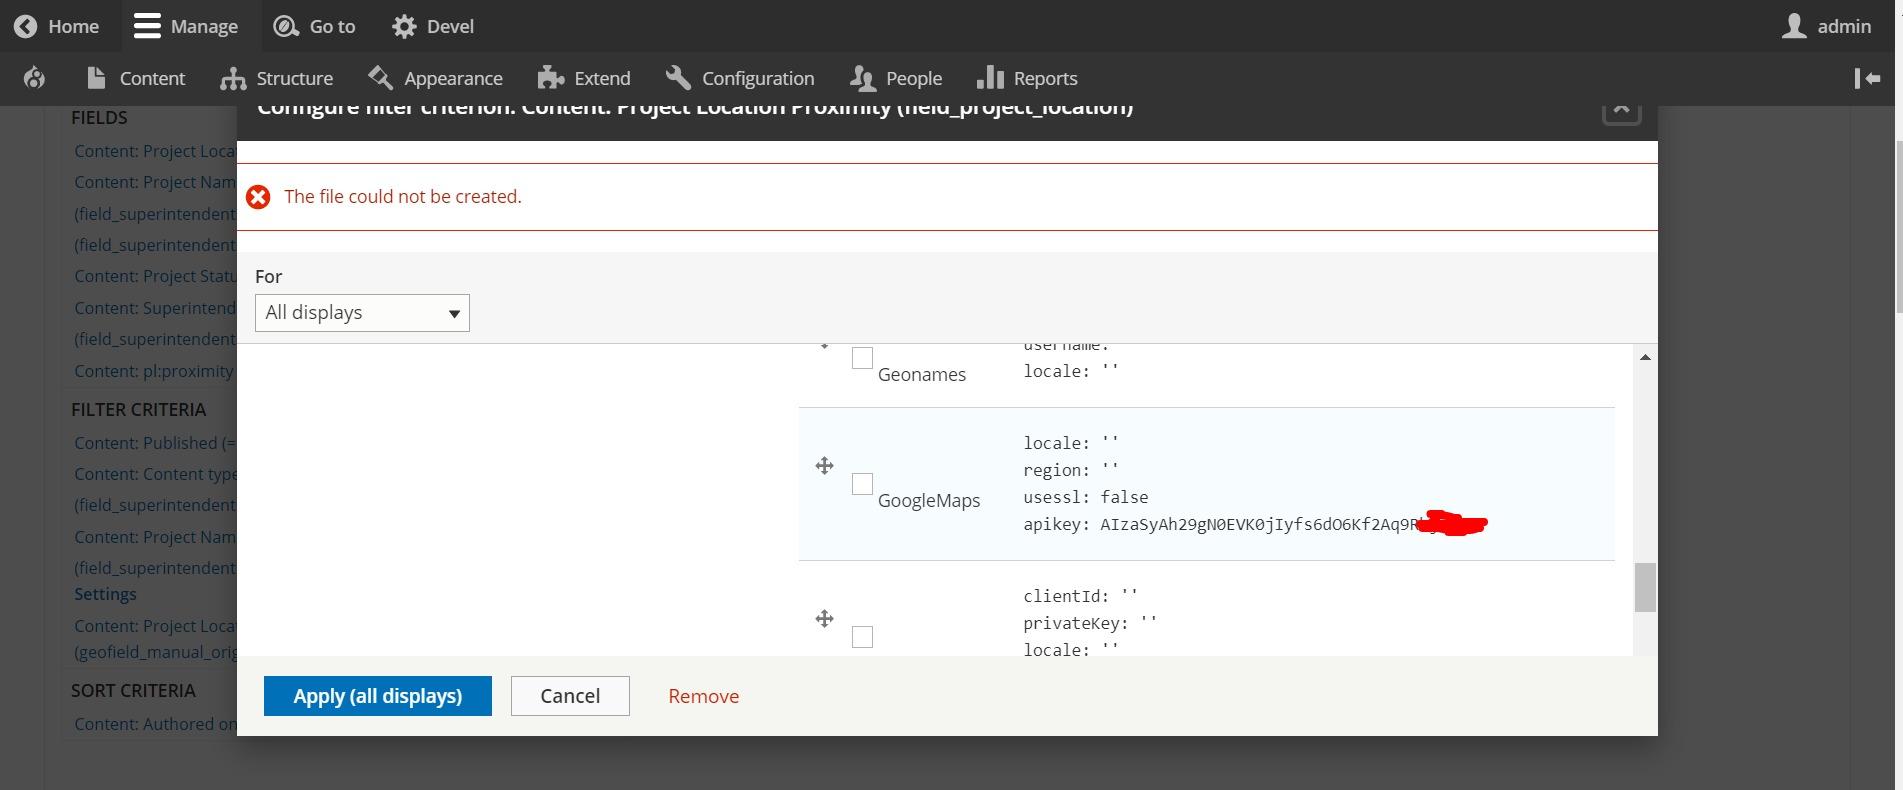 Proximity Filter with a Address Geocode (not Lat/Long values